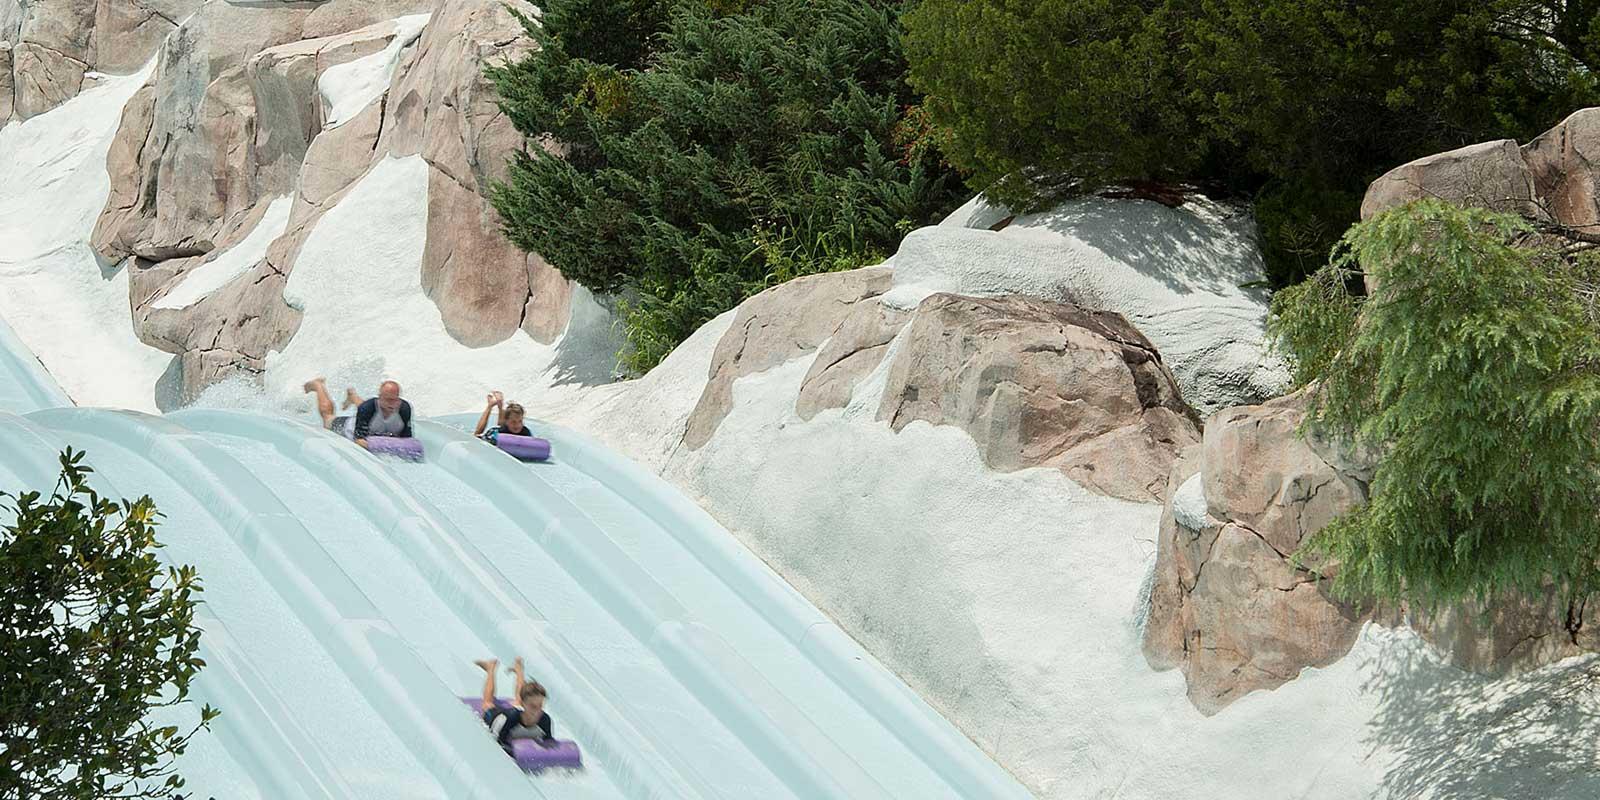 Photo of 3 people racing on the Toboggan Racers water slide at Blizzard Beach.